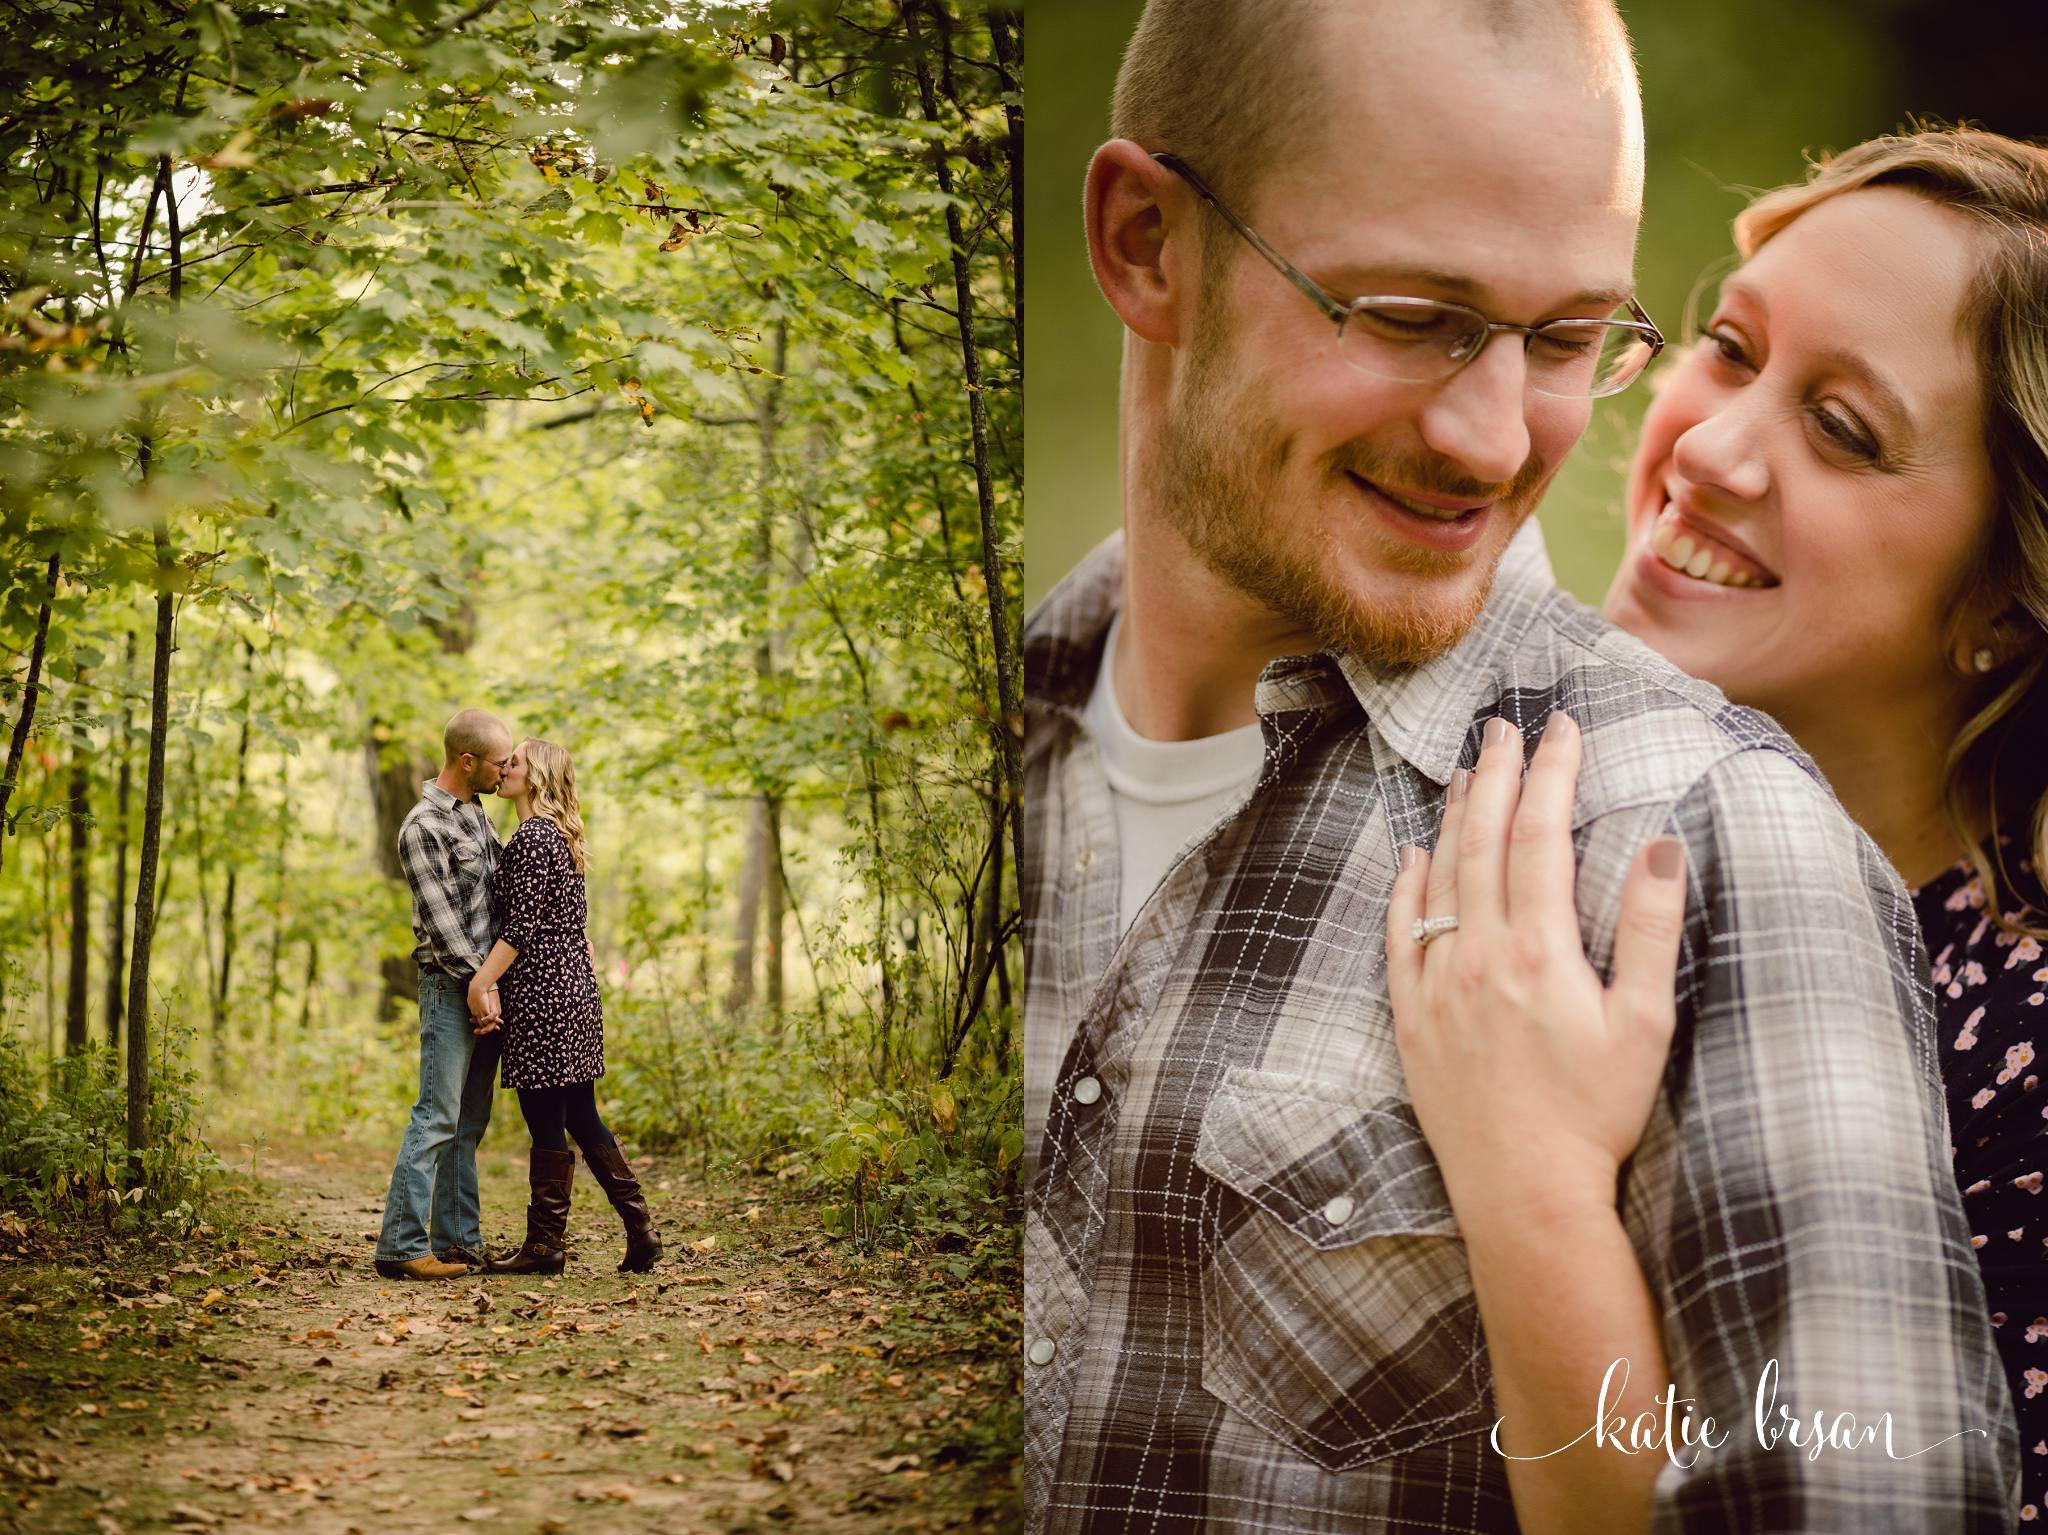 KatieBrsan-Frankfort-EngagementPhotos_0500.jpg